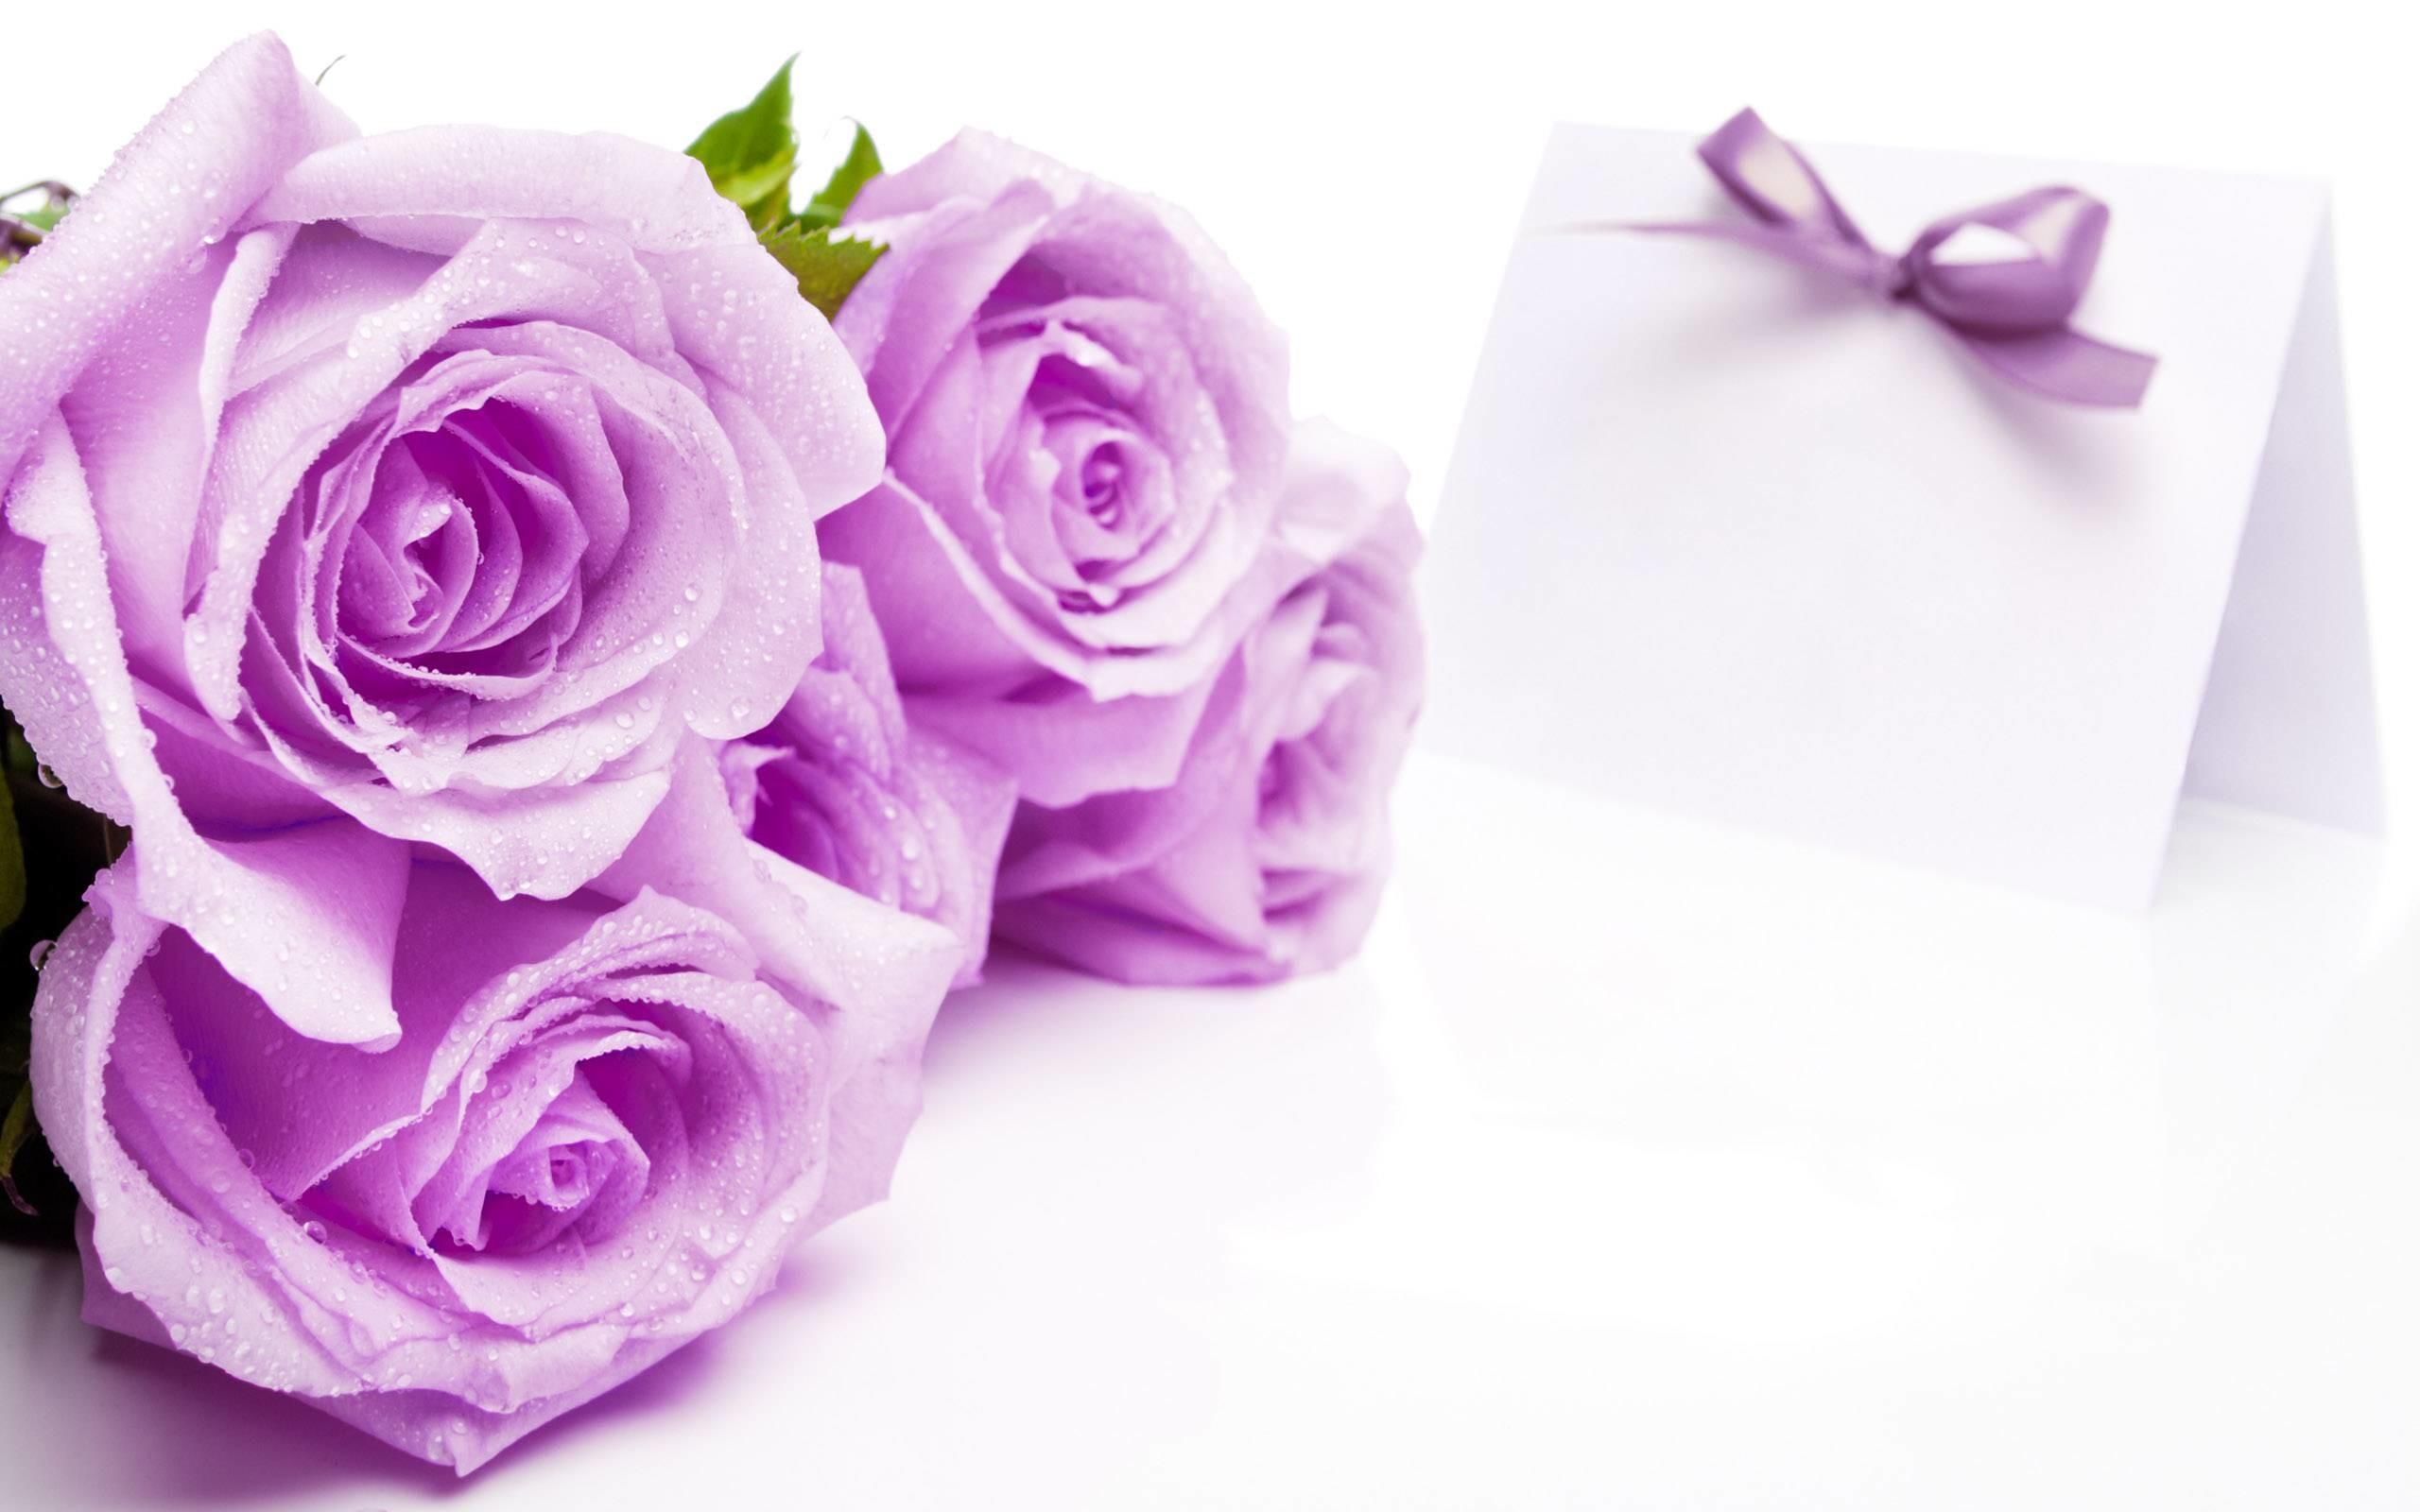 Pictures of beautiful flowers wallpapers 56 images 2560x1600 beautiful flowers pictures for facebook background 1 hd wallpapers izmirmasajfo